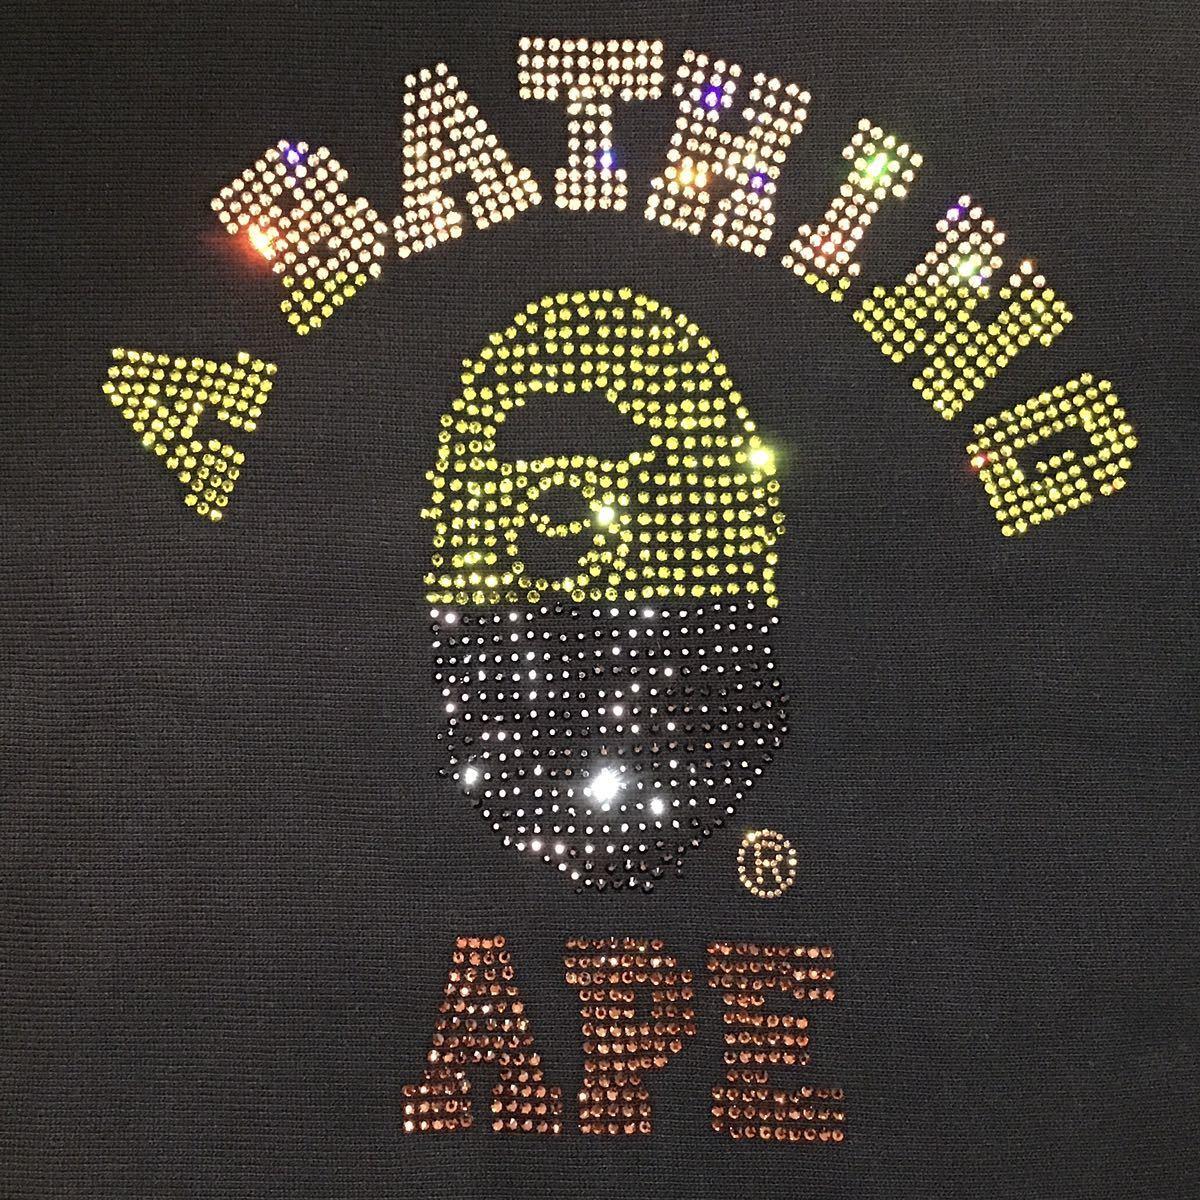 ★XL★ スワロフスキー カレッジロゴ 長袖 スウェット a bathing ape bape swarovski ラインストーン エイプ ベイプ college logo nigo 313